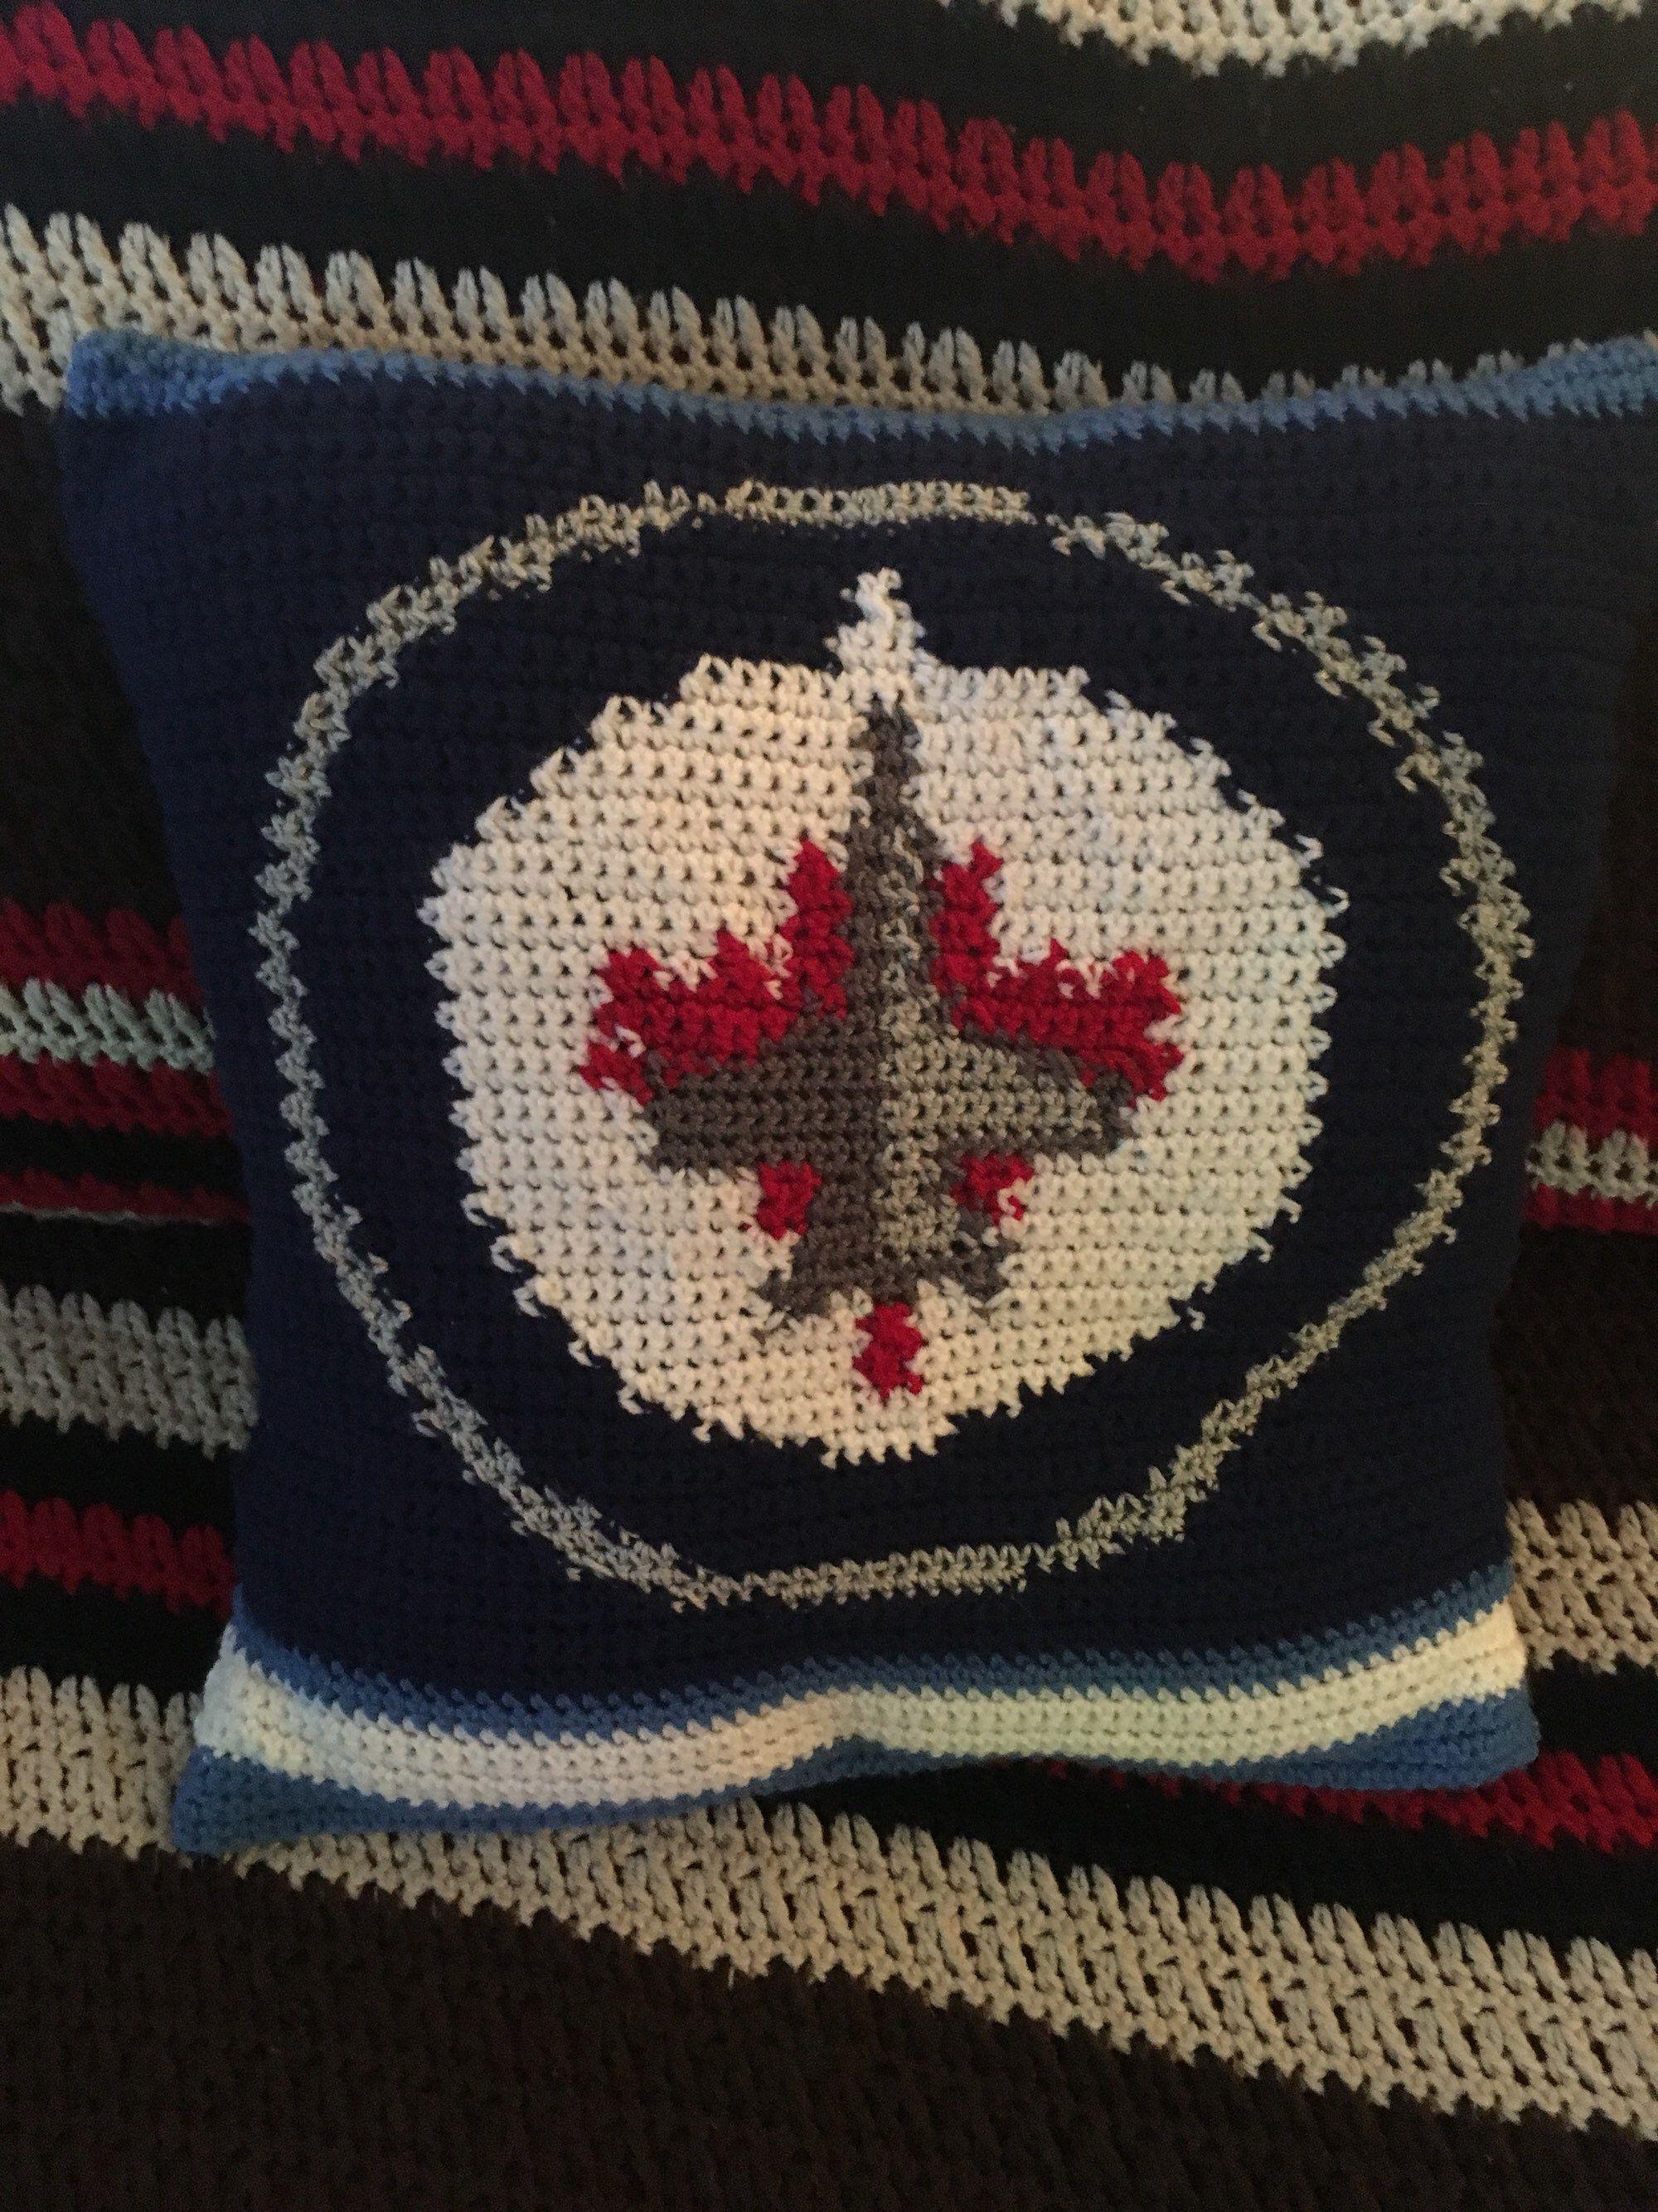 online retailer c48b4 06486 Crochet Winnipeg Jets Pillow Cover | Hockey Crochet ...